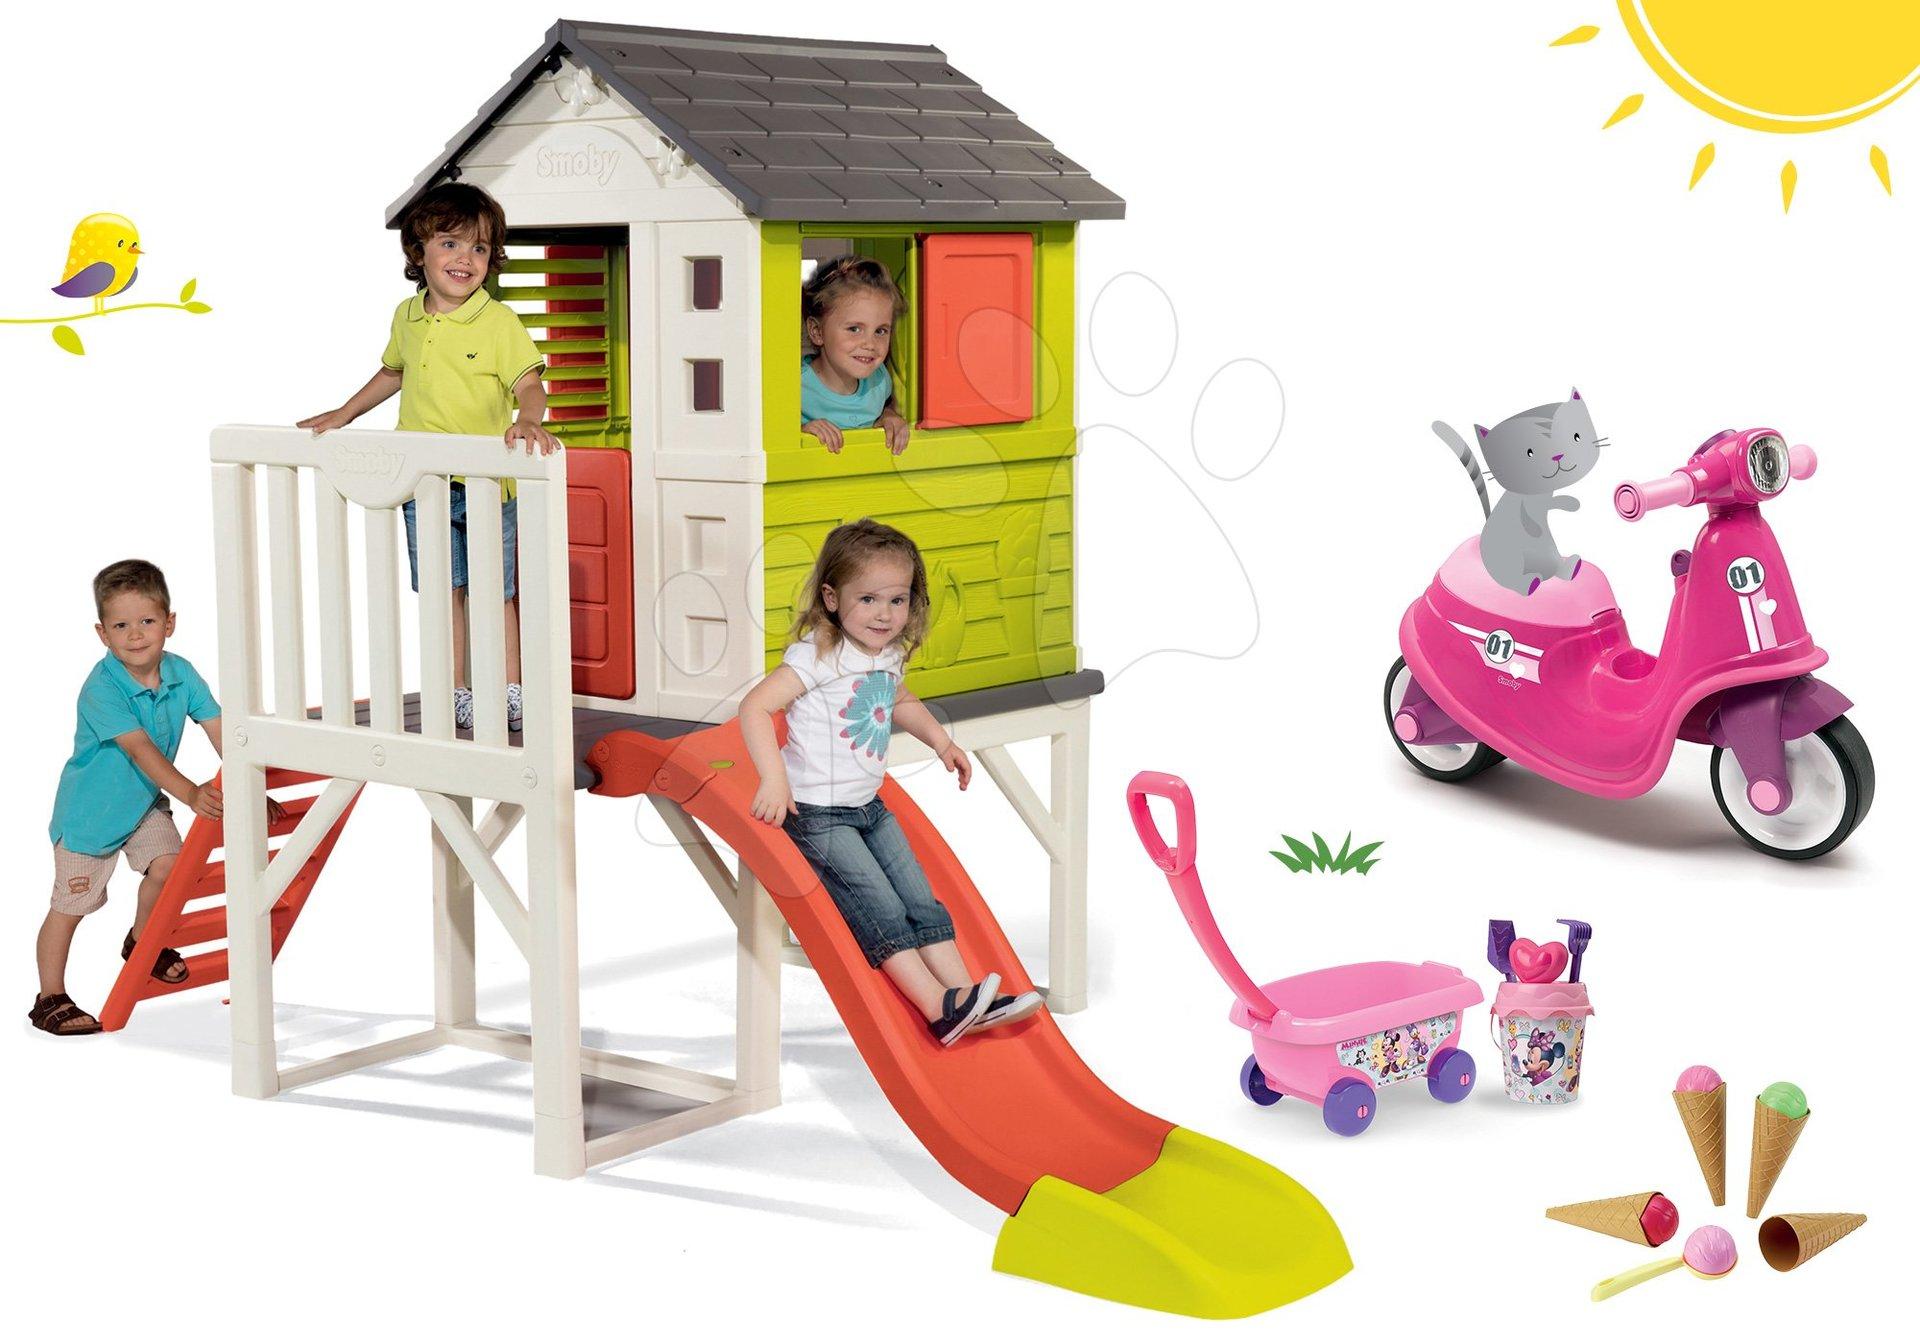 Smoby set detský domček na pilieroch Pilings House s 1,5 m šmykľavkou a odrážadlo s gumenými kolesami a vozík s vedrom a zmrzlinou 810800-24